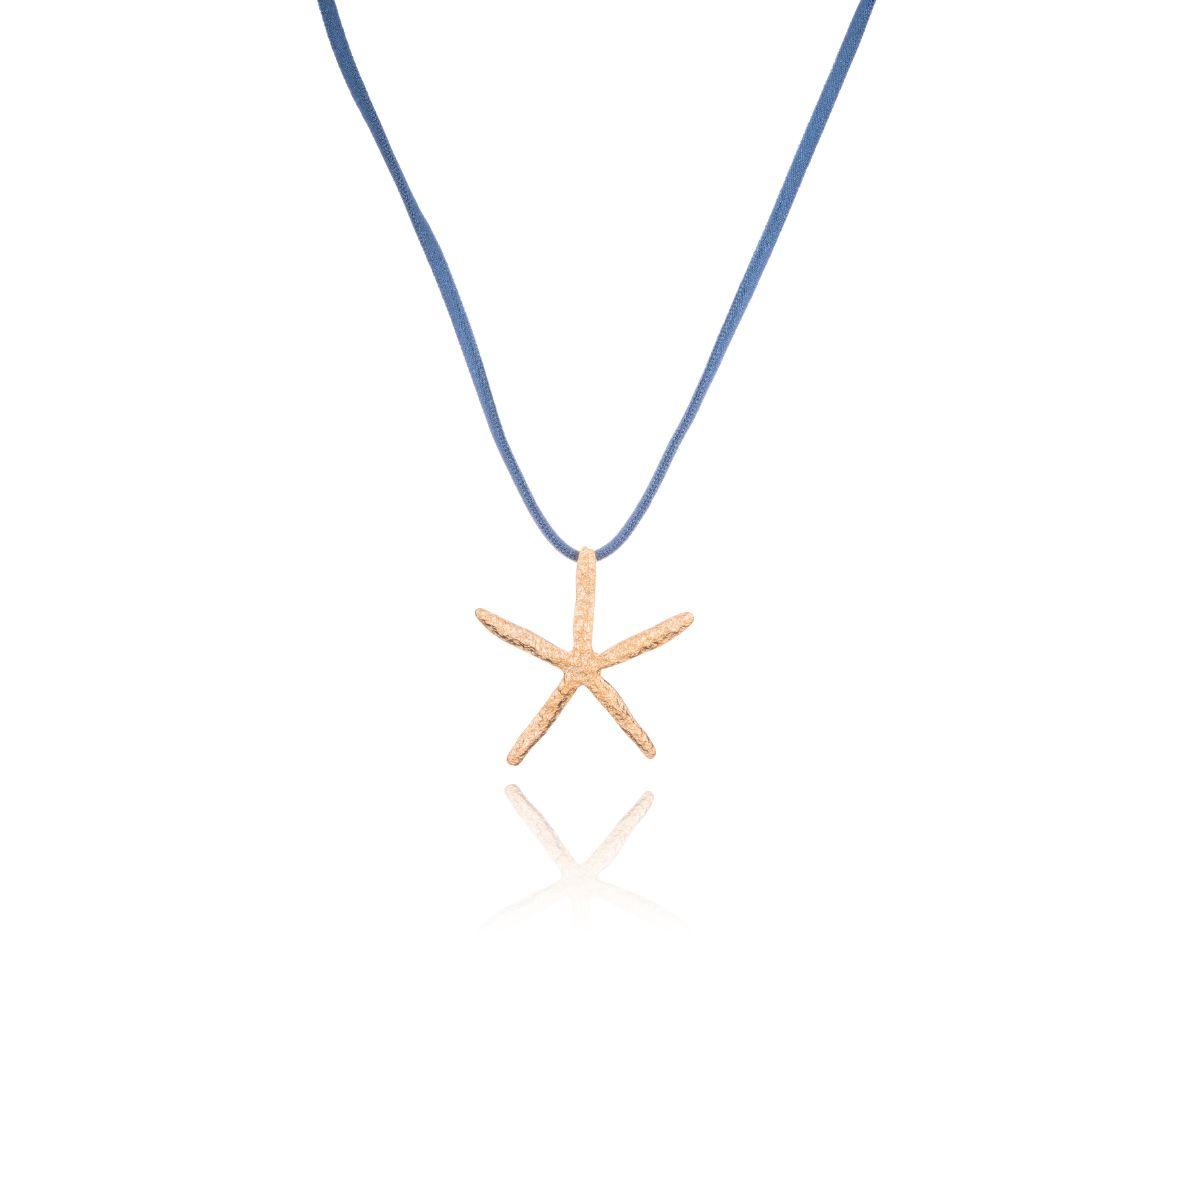 Marina collar corto de cinta elástica satinada con estrella de mar colgando bañada en oro mate